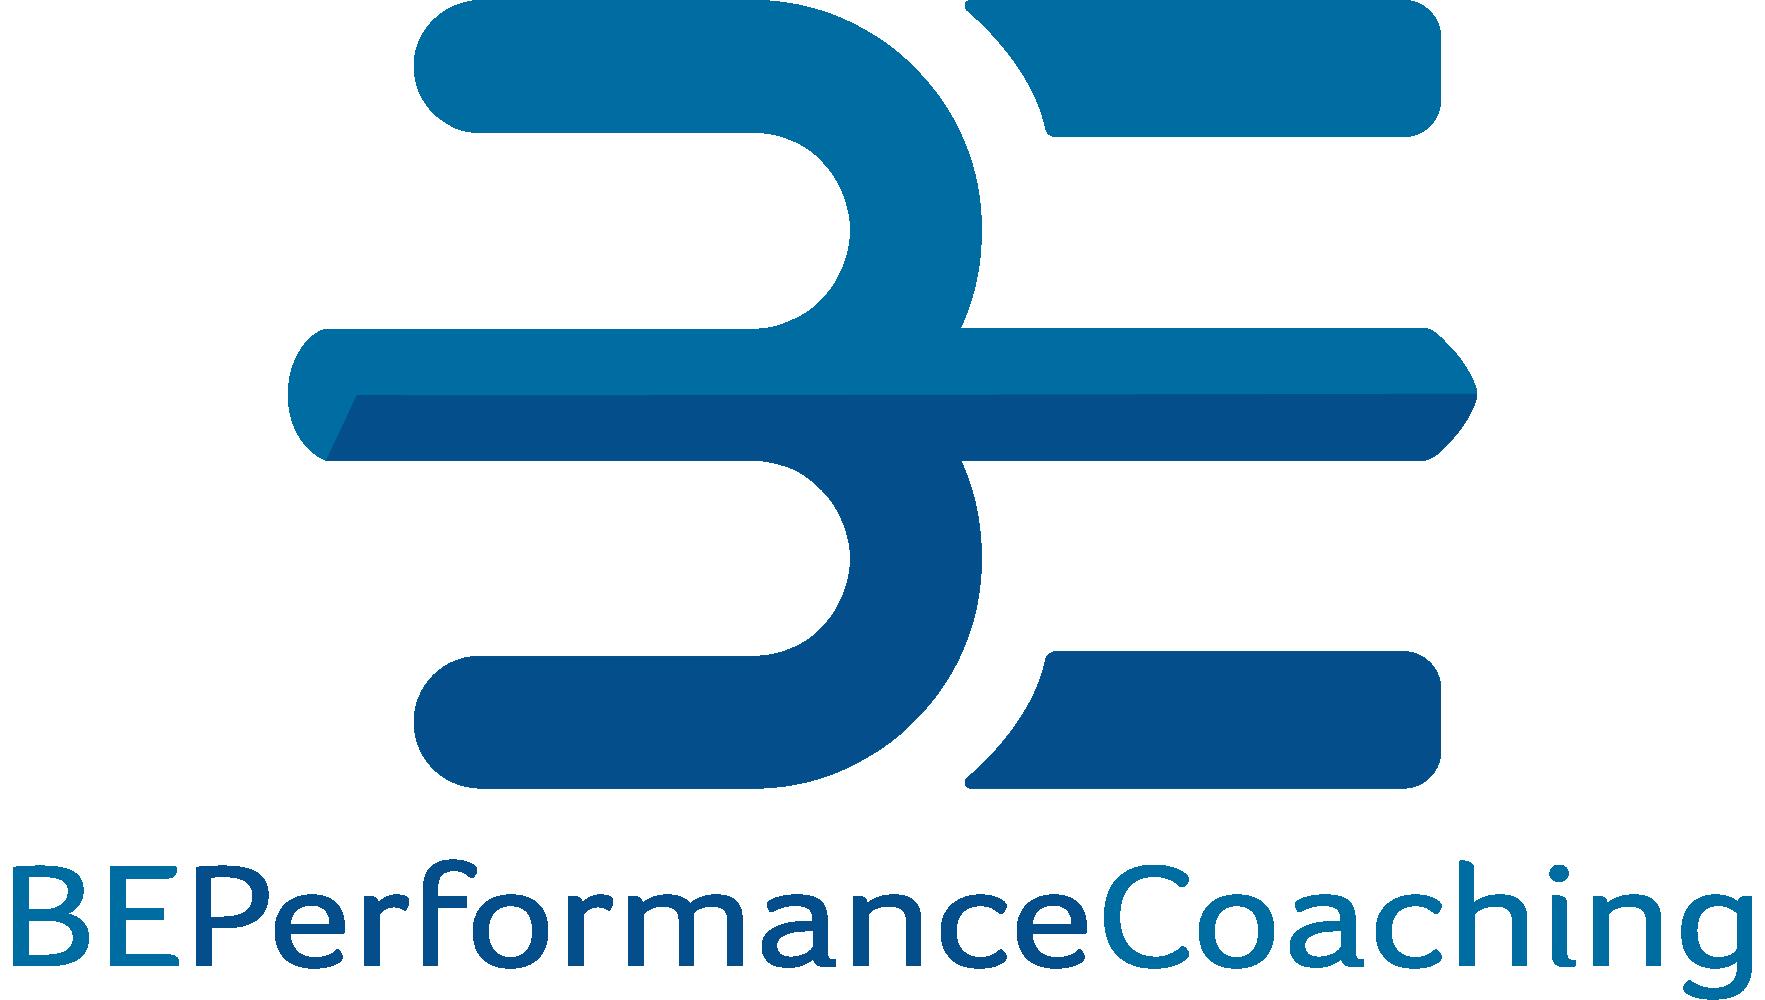 BE Performance Coaching